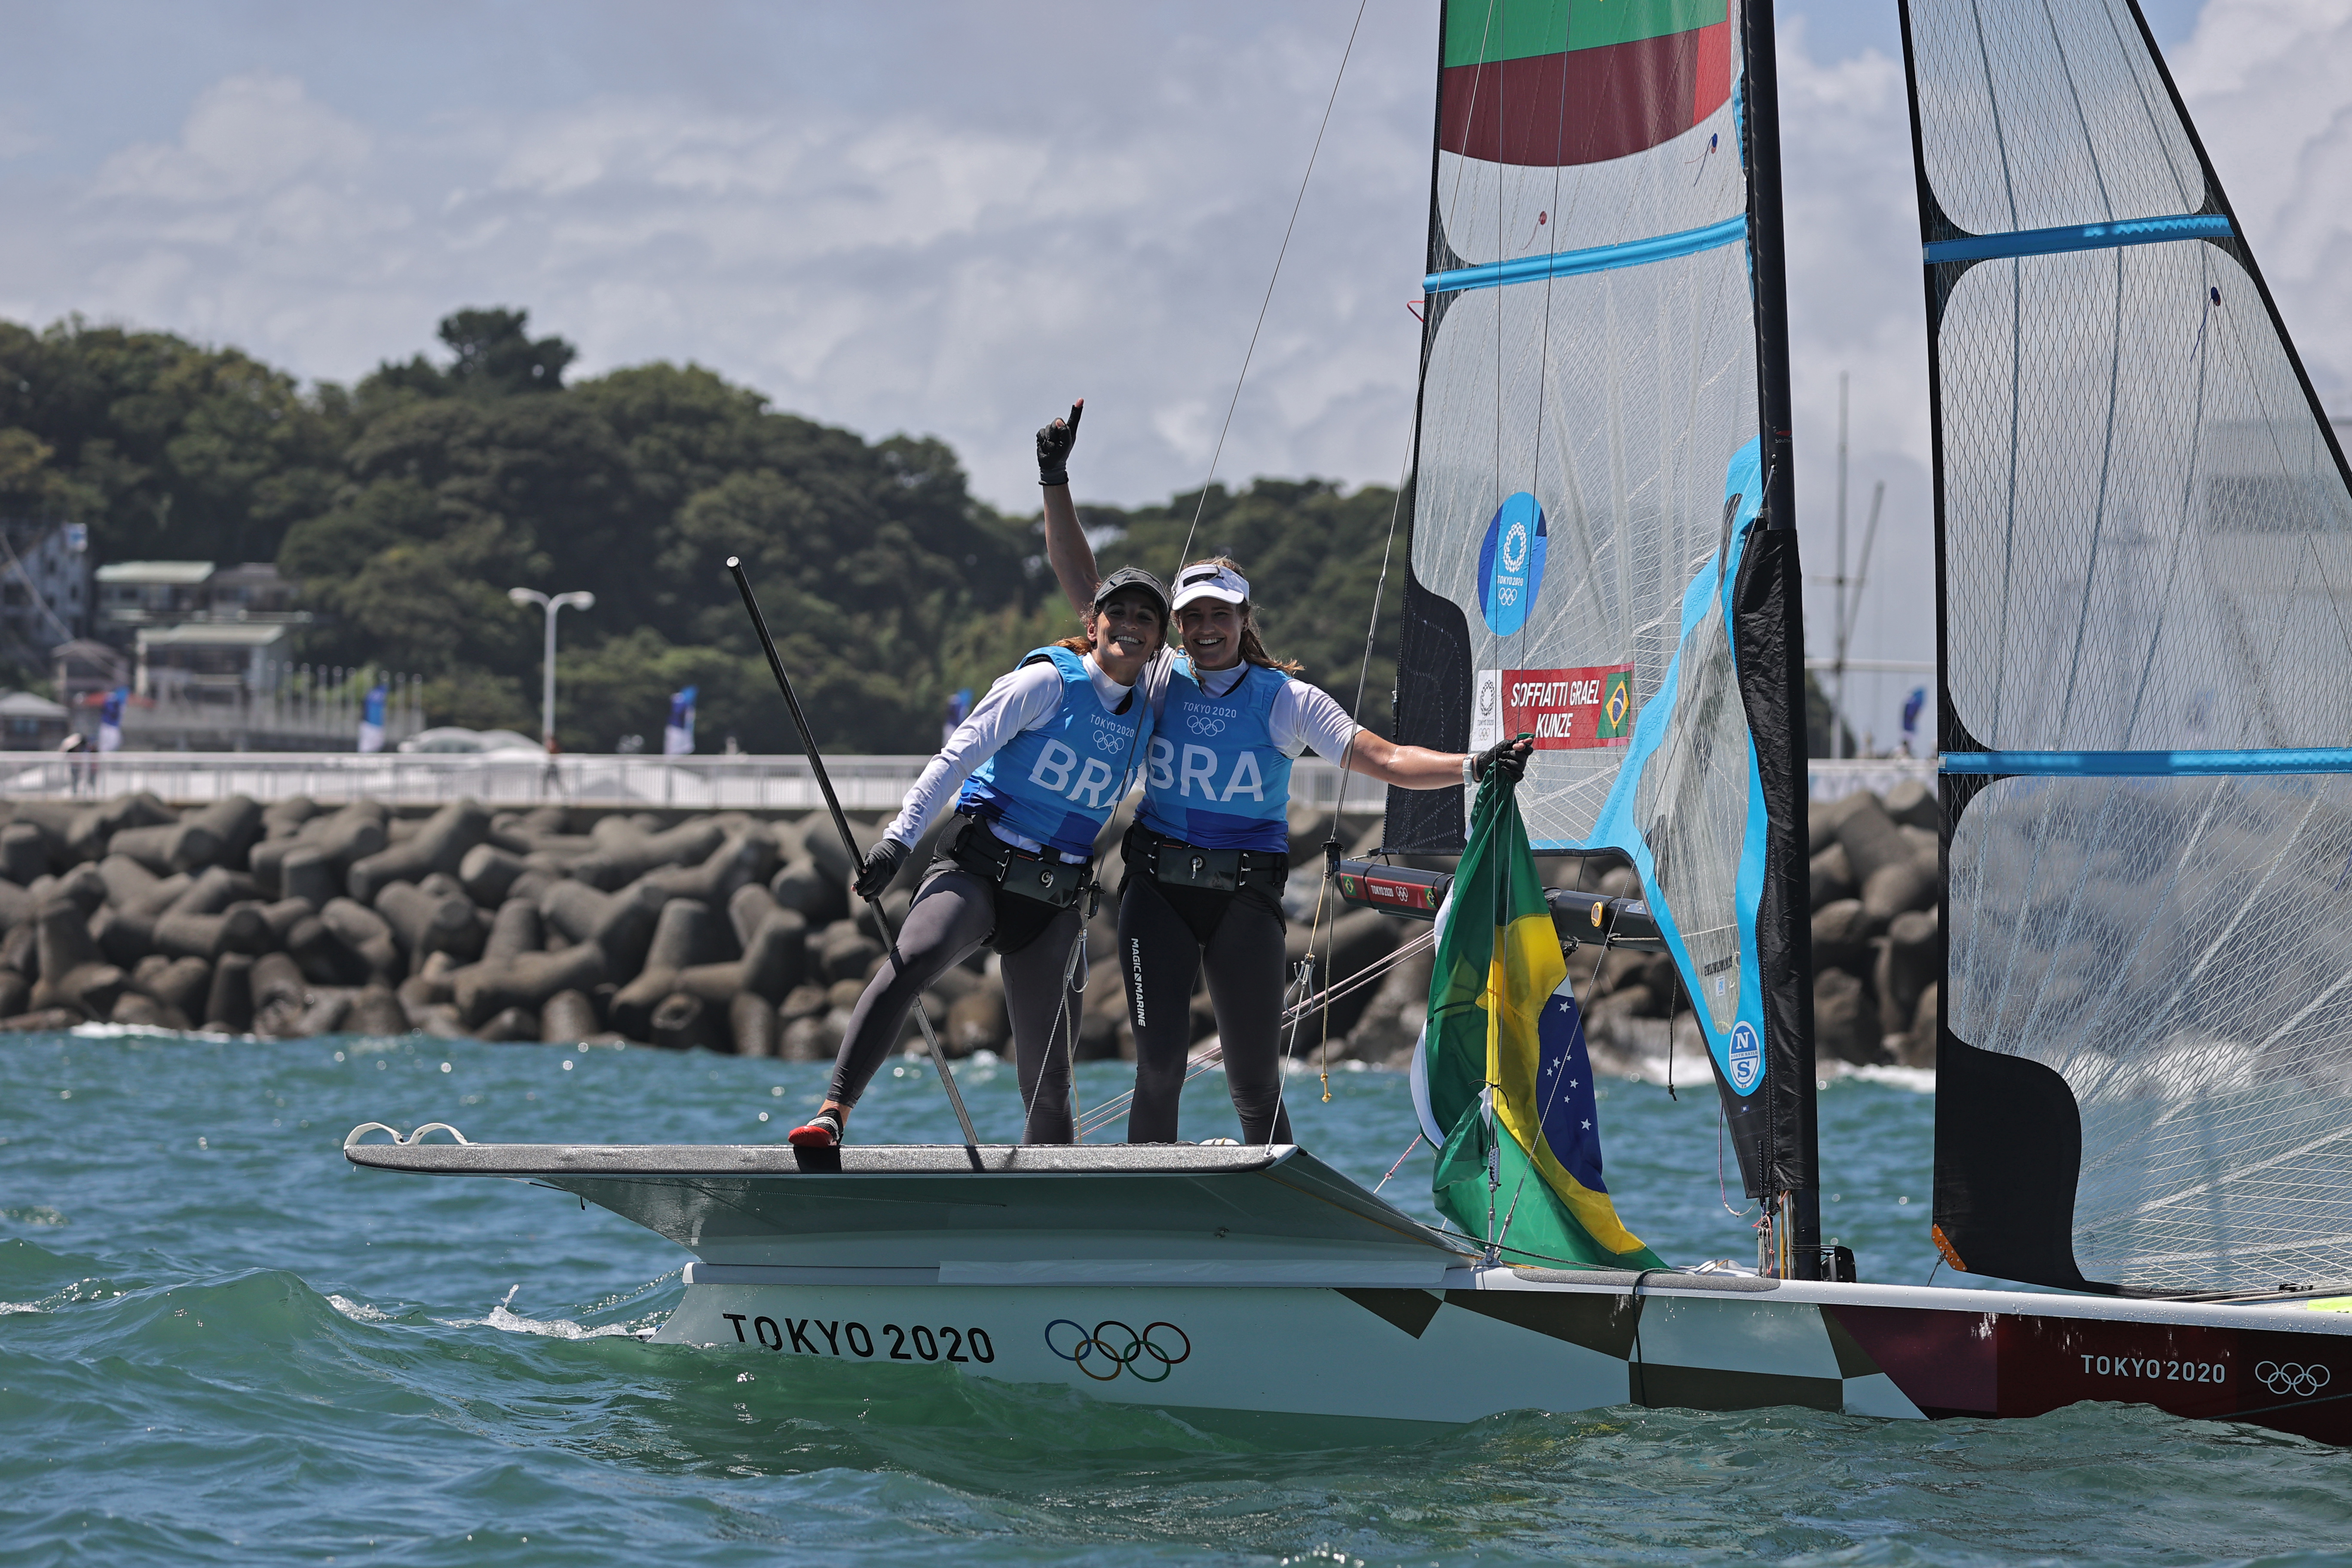 Tokyo 2020 Olympics - Sailing - Women's 49er FX - Medal Race - Enoshima Yacht Harbour - Tokyo, Japan - August 3, 2021. Martine Grael of Brazil and Kahena Kunze of Brazil celebrate winning gold after the race. REUTERS/Carlos Barria